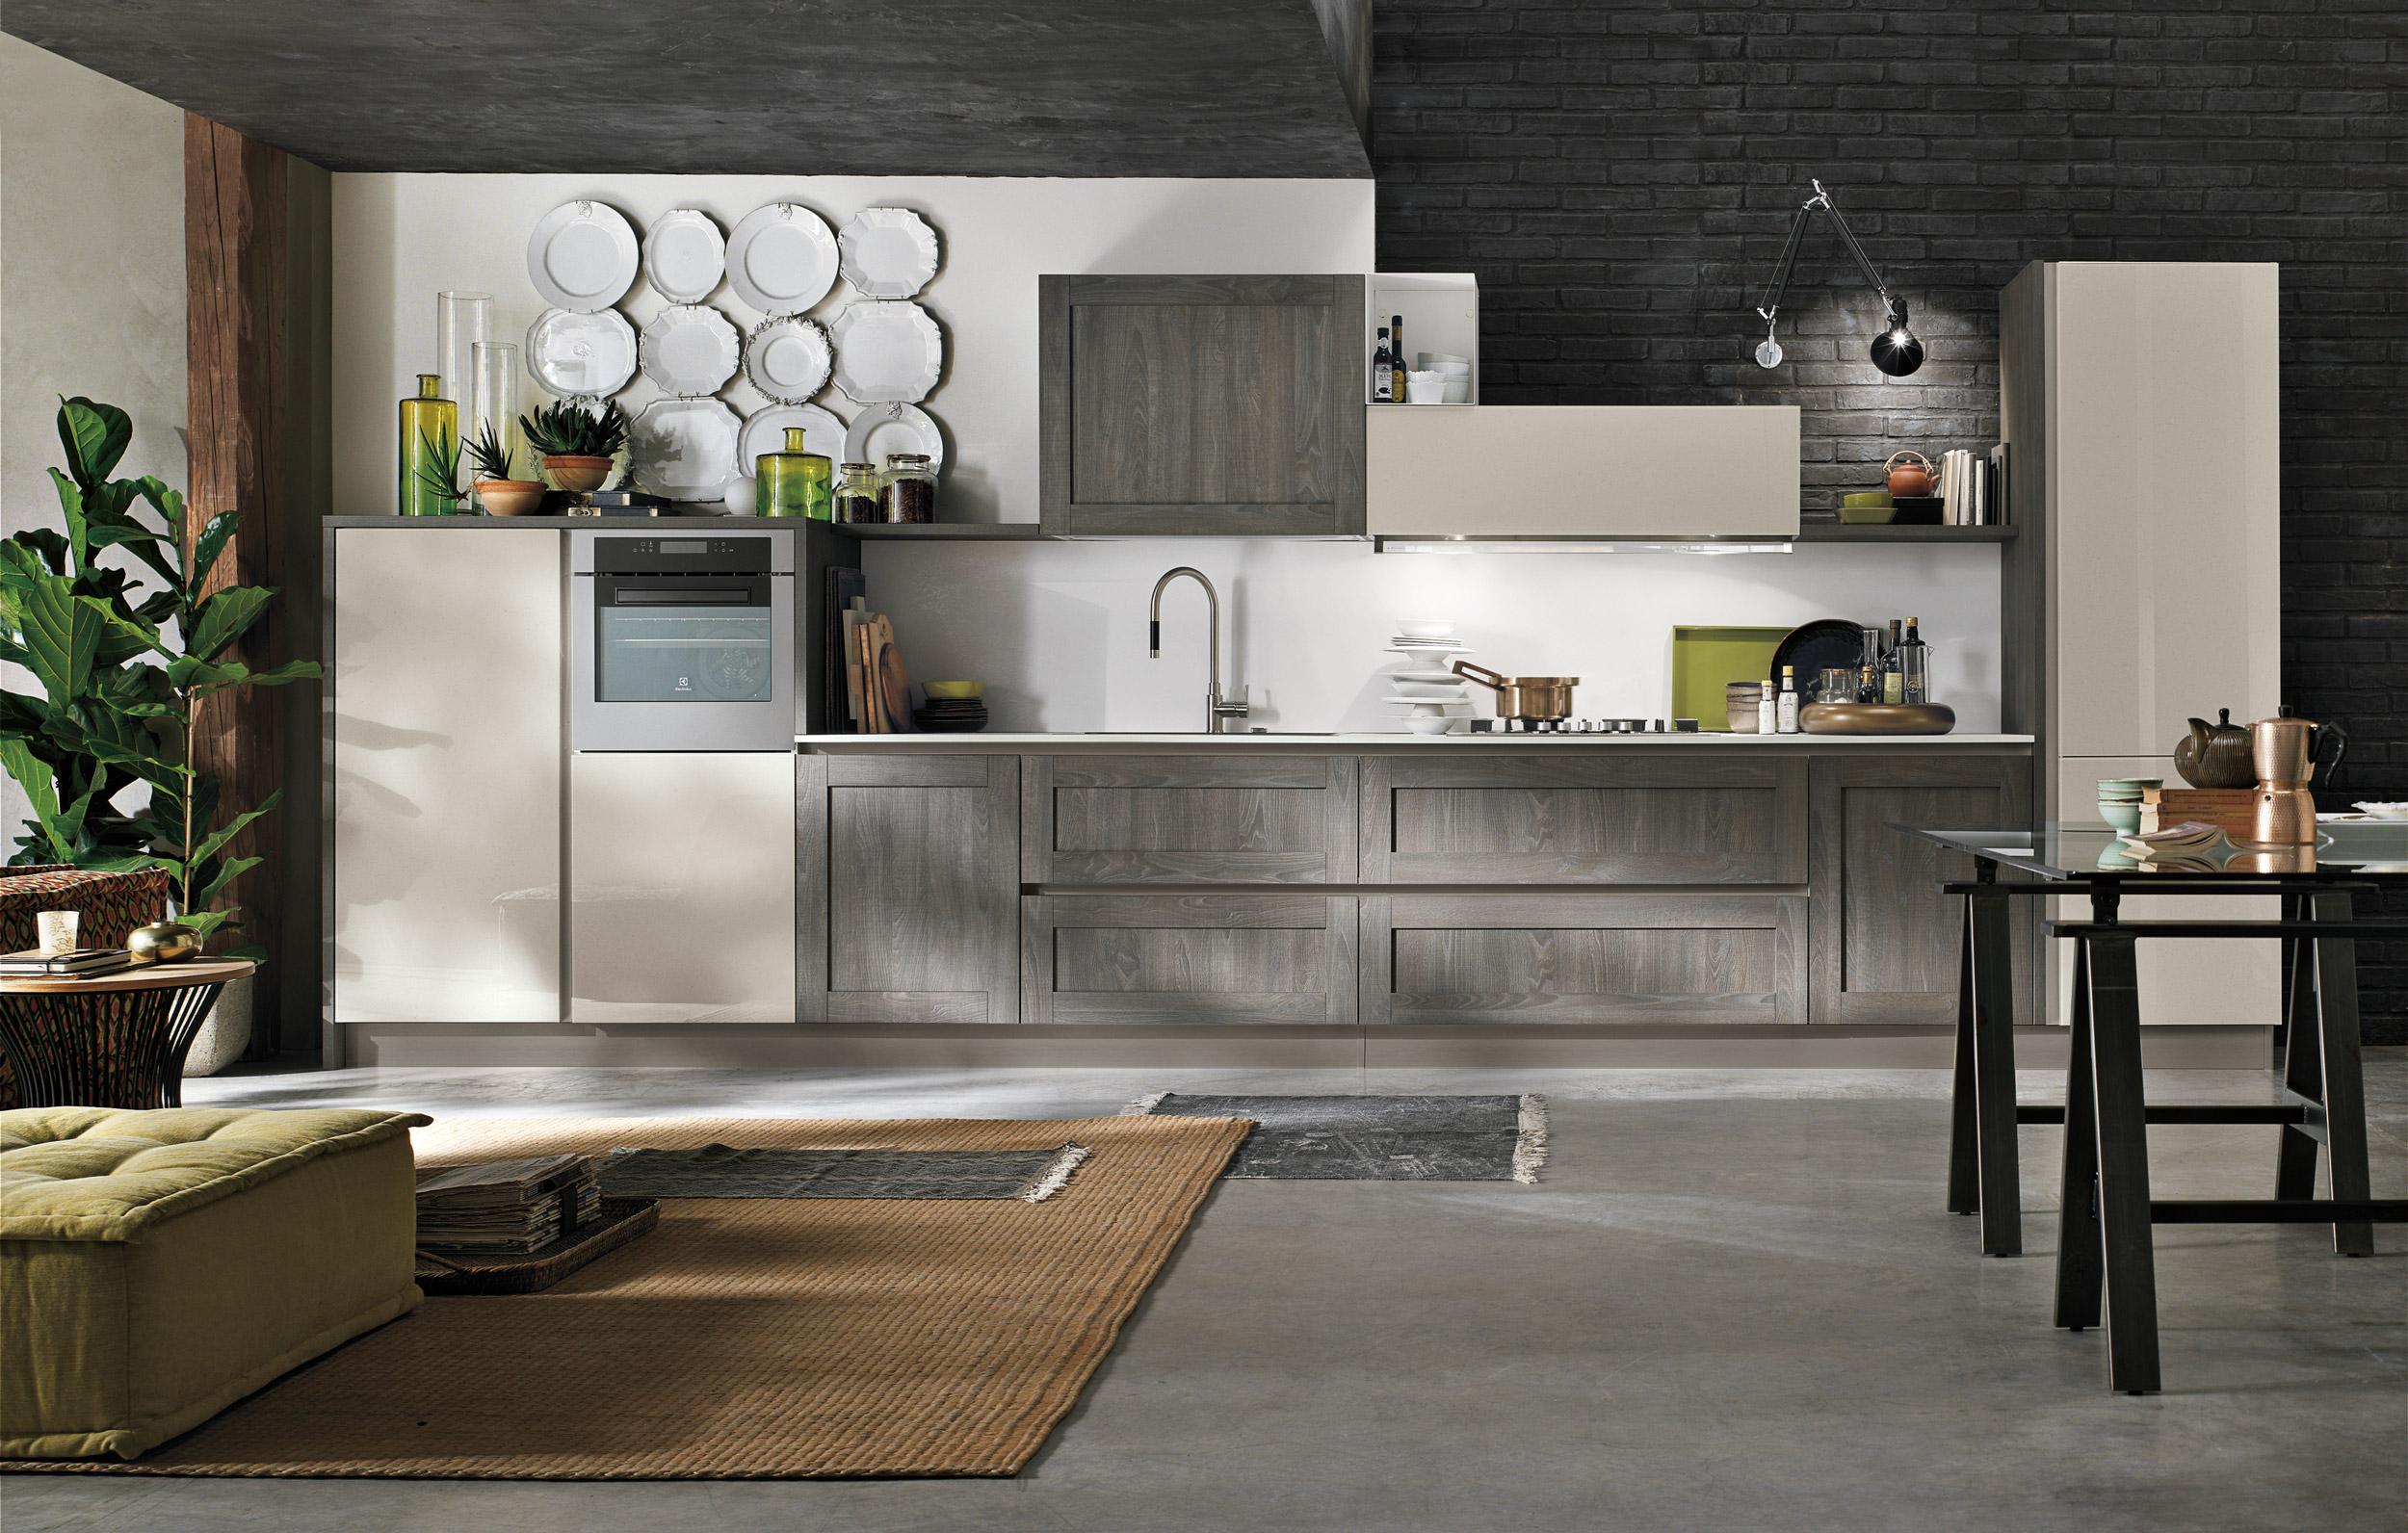 Cucina stosa aliant lorenzelli arredamenti - Cucine stosa moderne ...